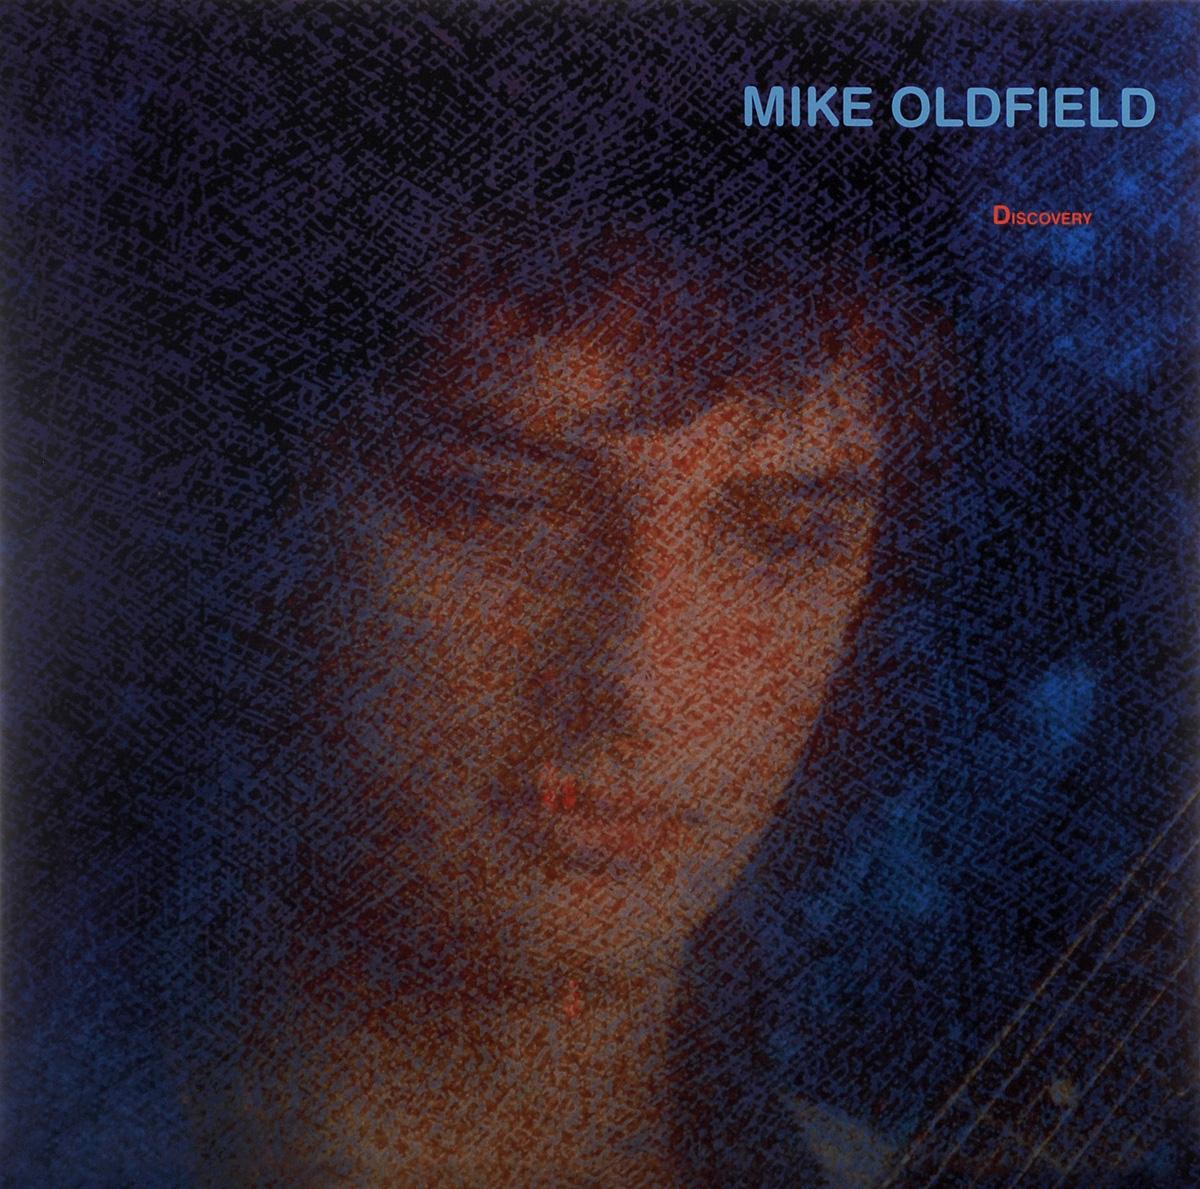 Майк Олдфилд Mike Oldfield. Discovery (LP) майк олдфилд mike oldfield tubular bells ii lp